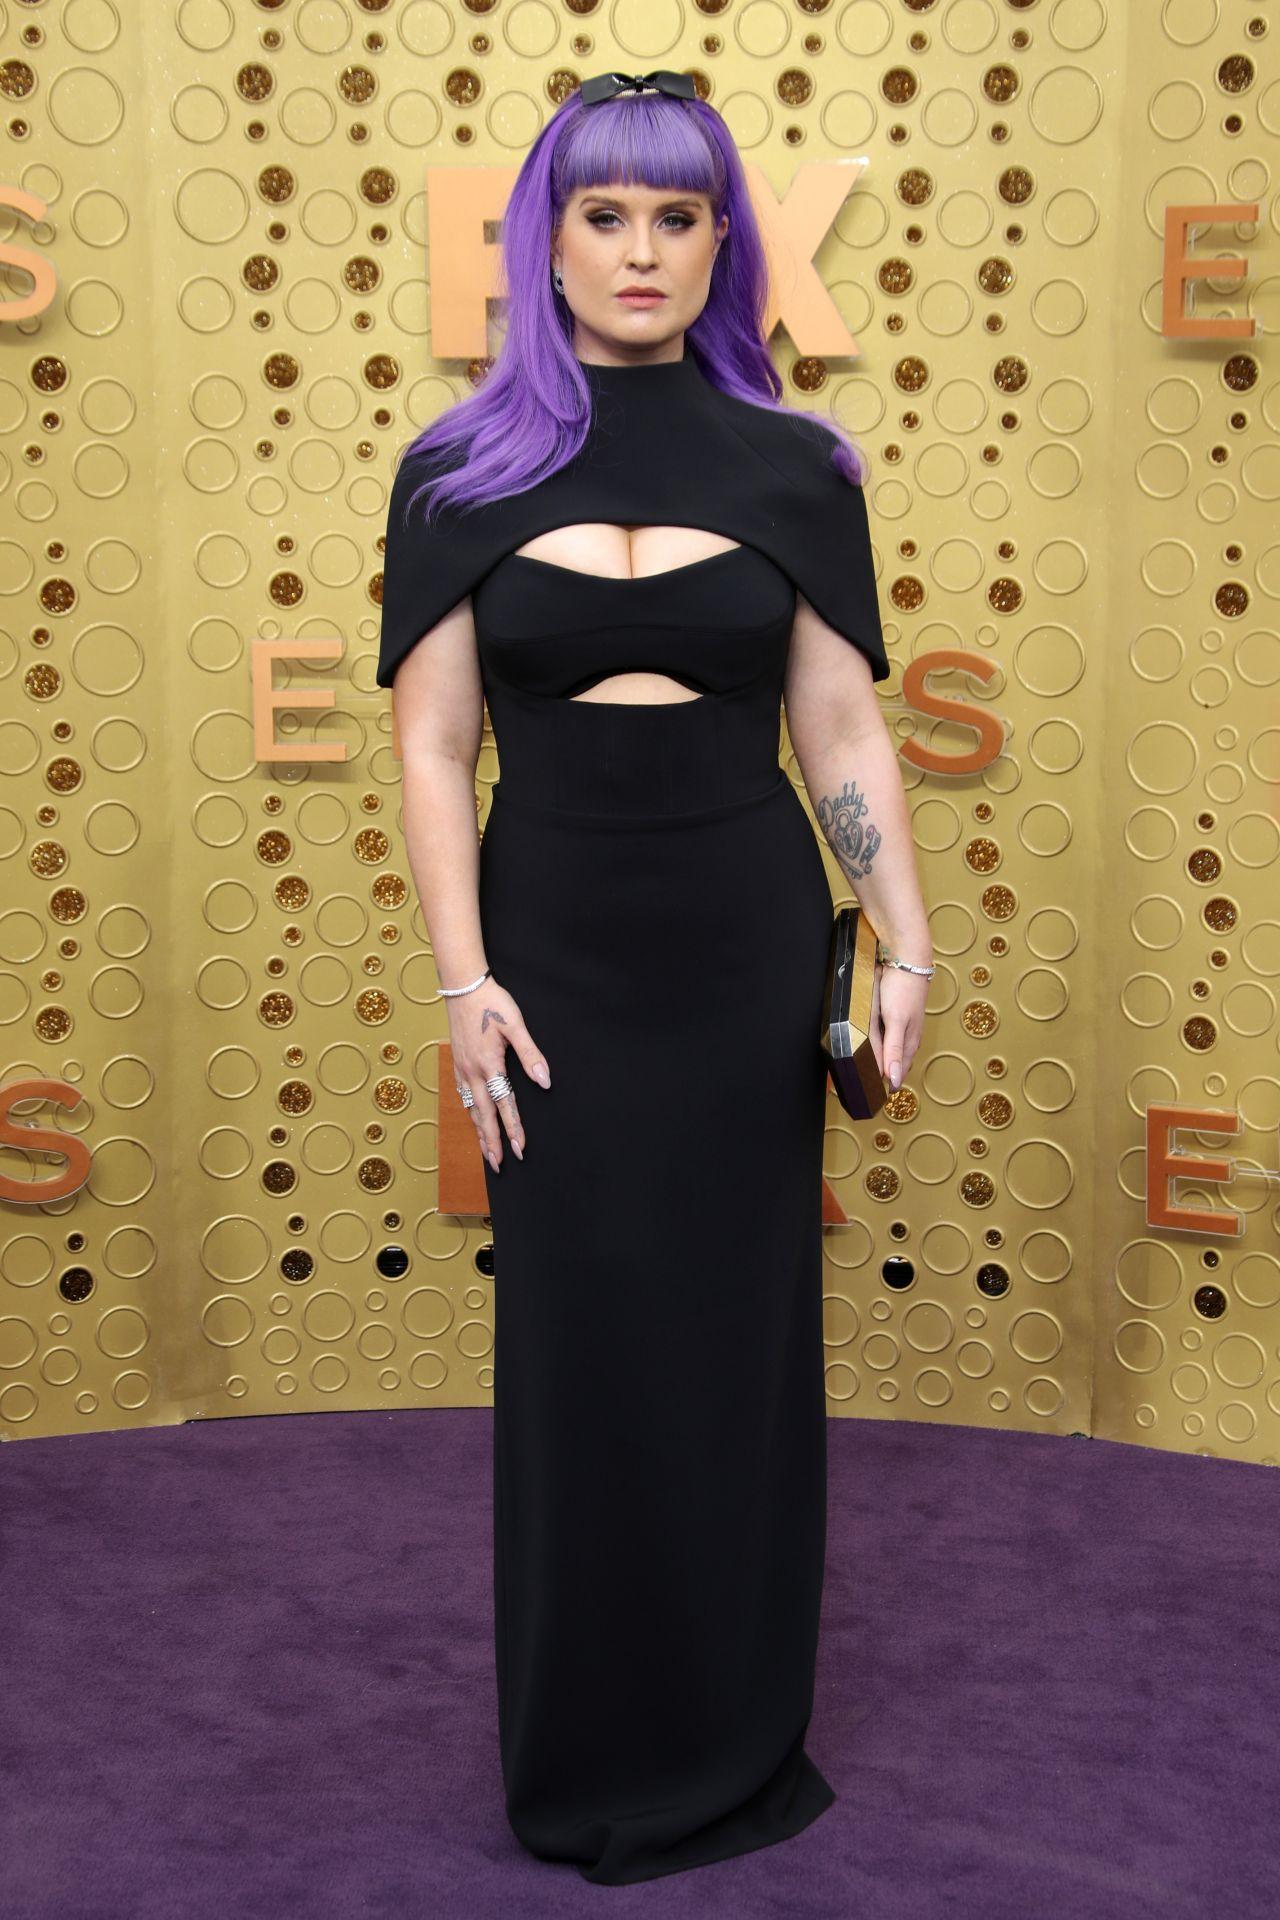 Kelly Osbourne – 2019 Emmy Awards Kelly Osbourne 2020 Pic